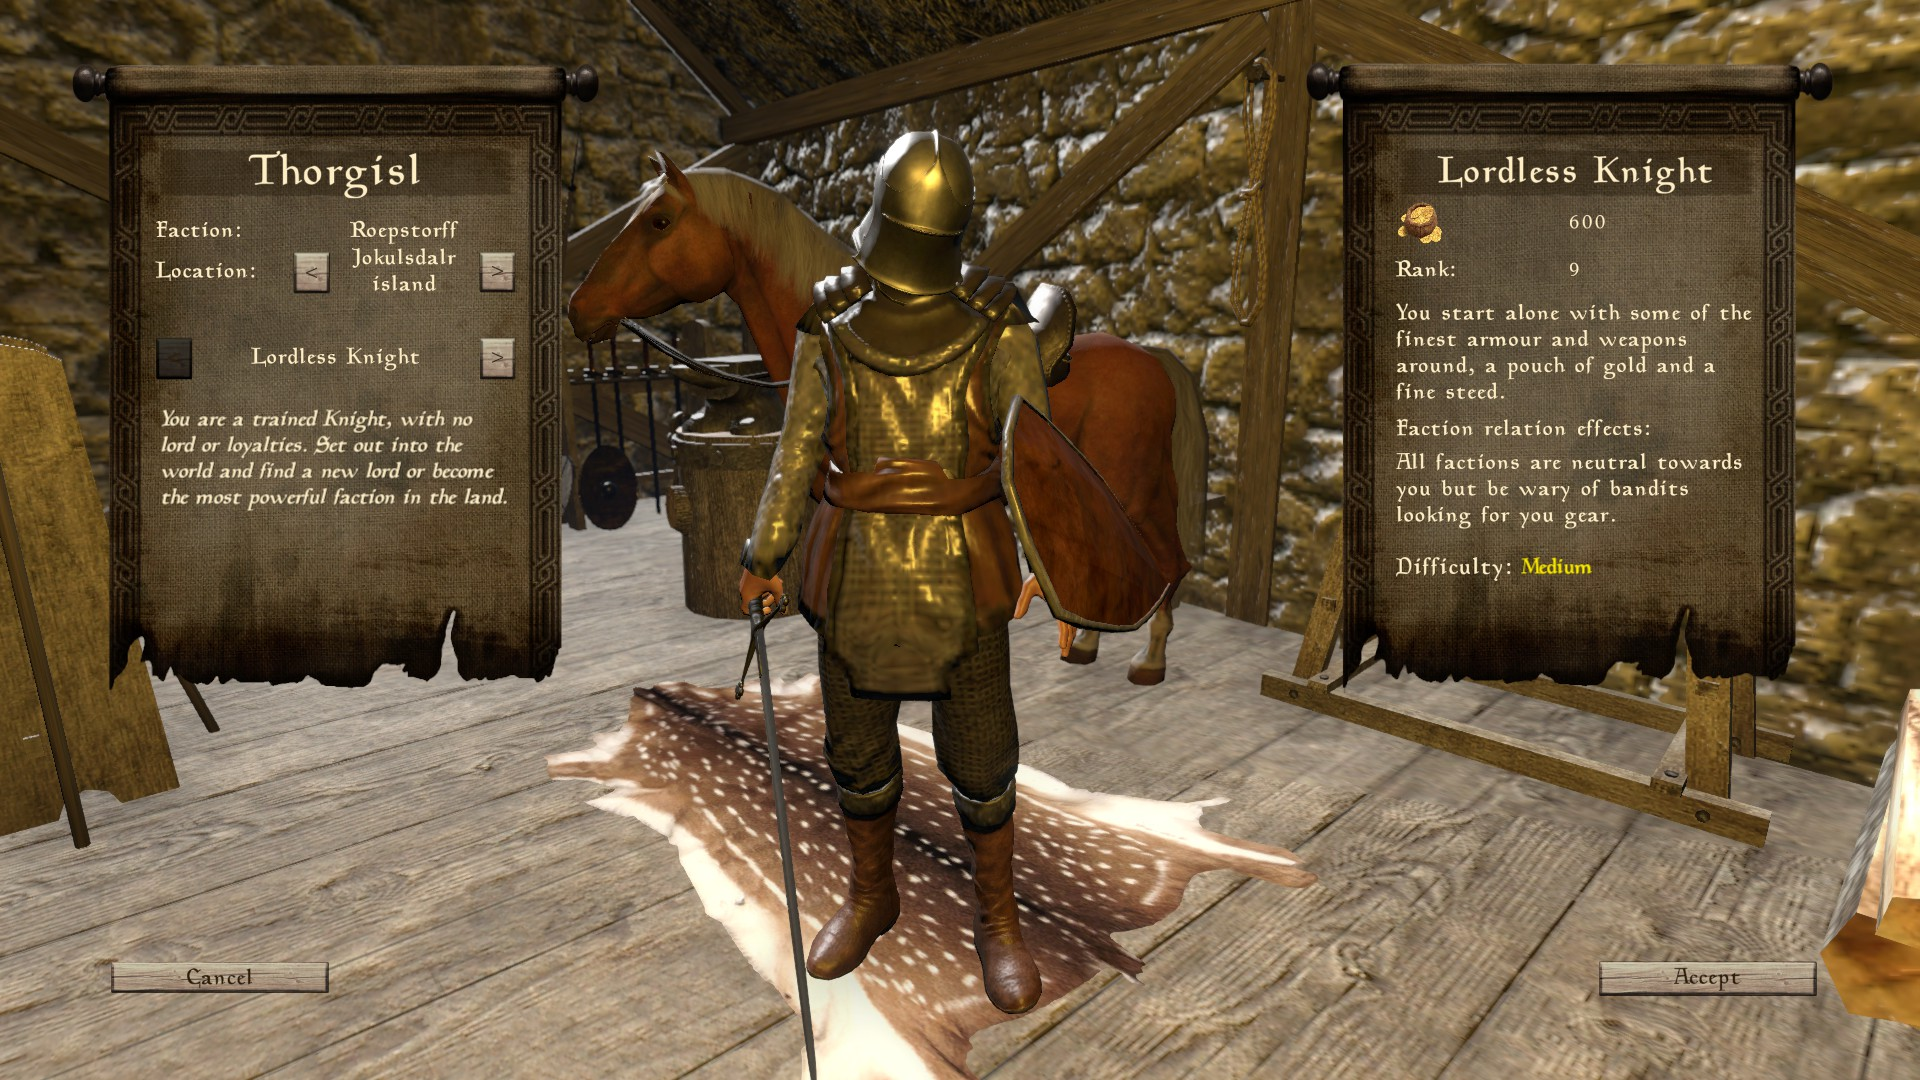 Lordless Knight